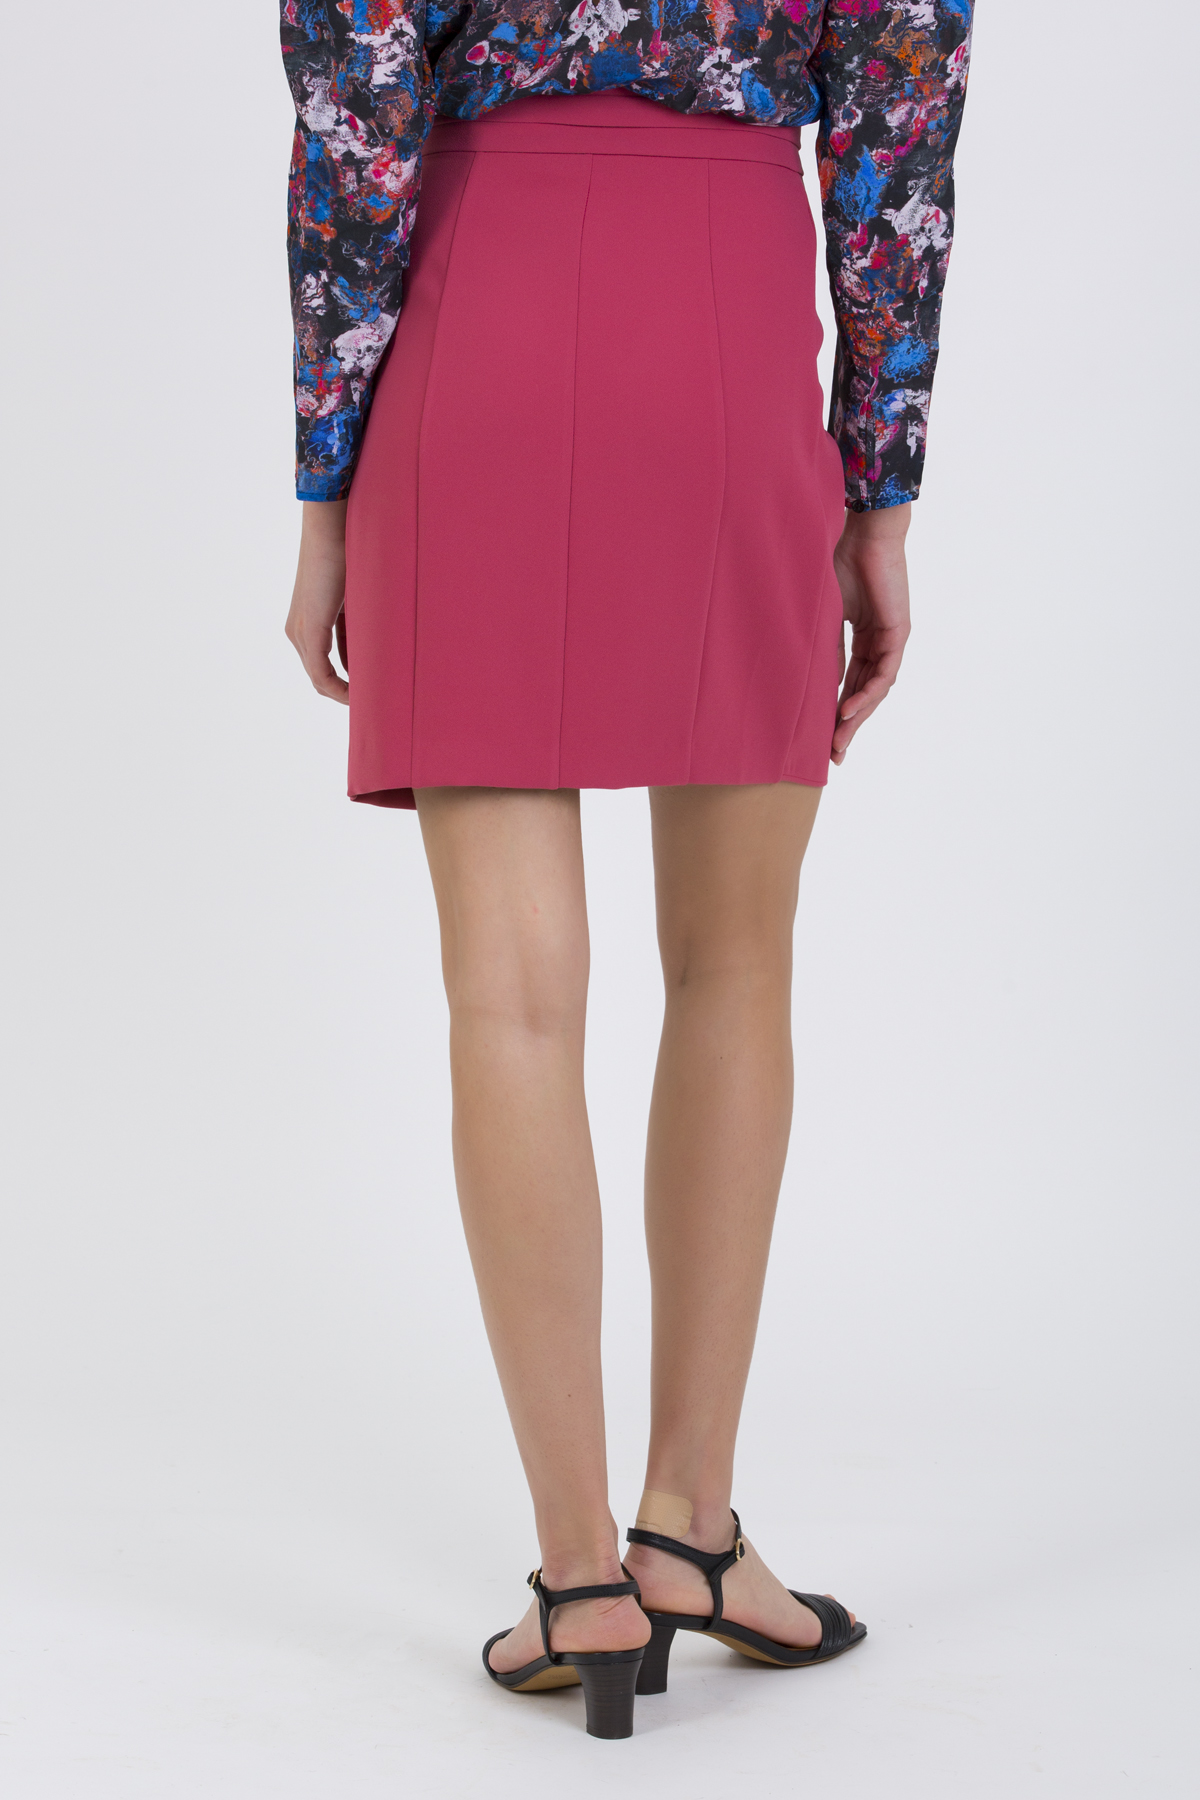 rama-drapped-gathered-skirt-short-high-waist-iro-framboise-matchboxathens